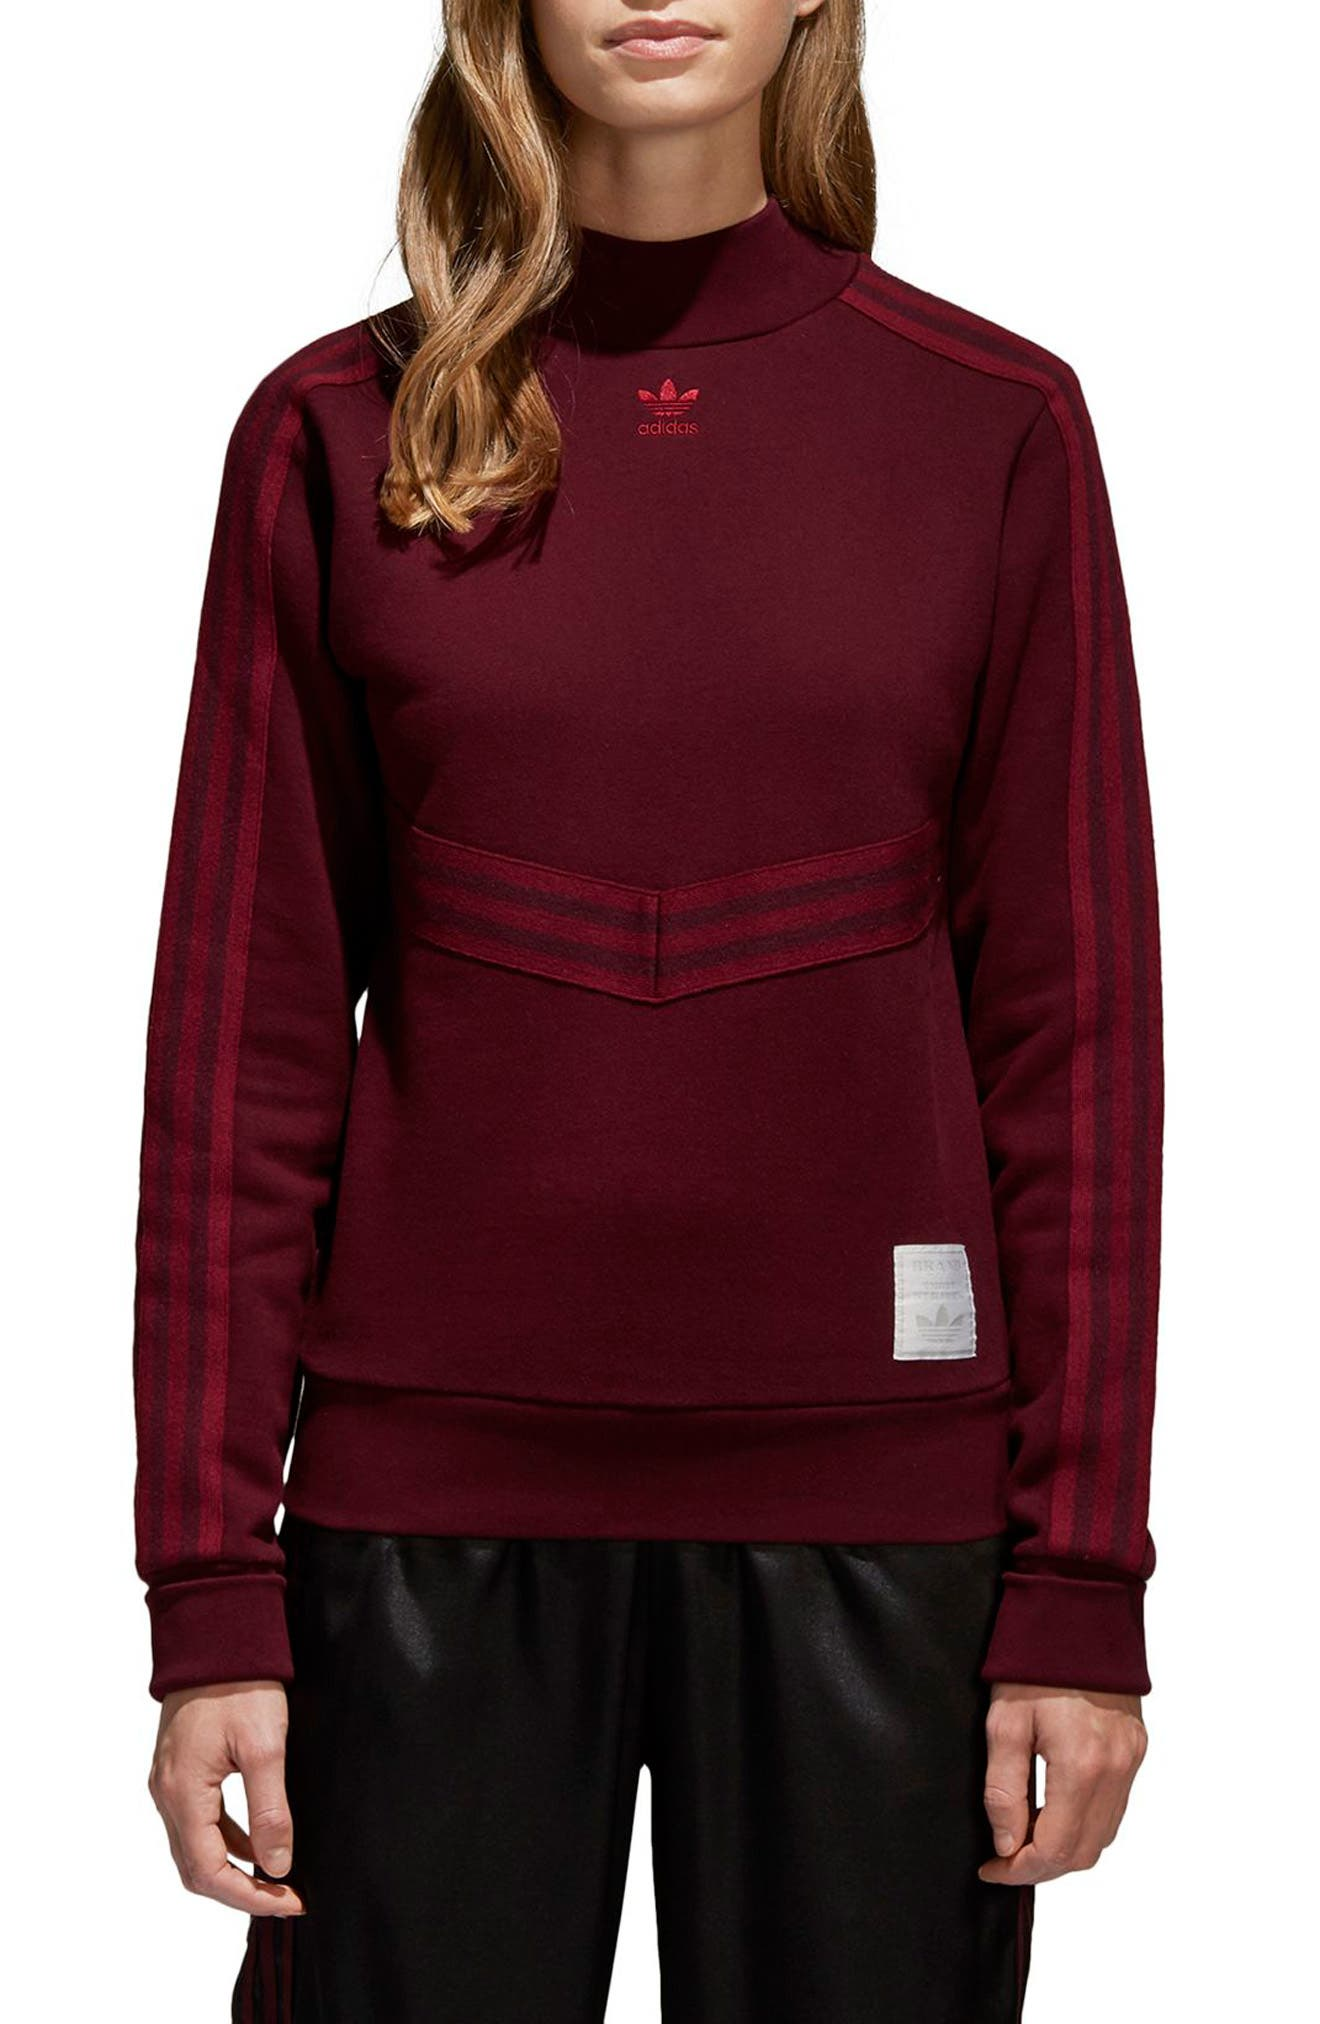 Originals Adibreak Sweatshirt,                             Main thumbnail 1, color,                             Maroon